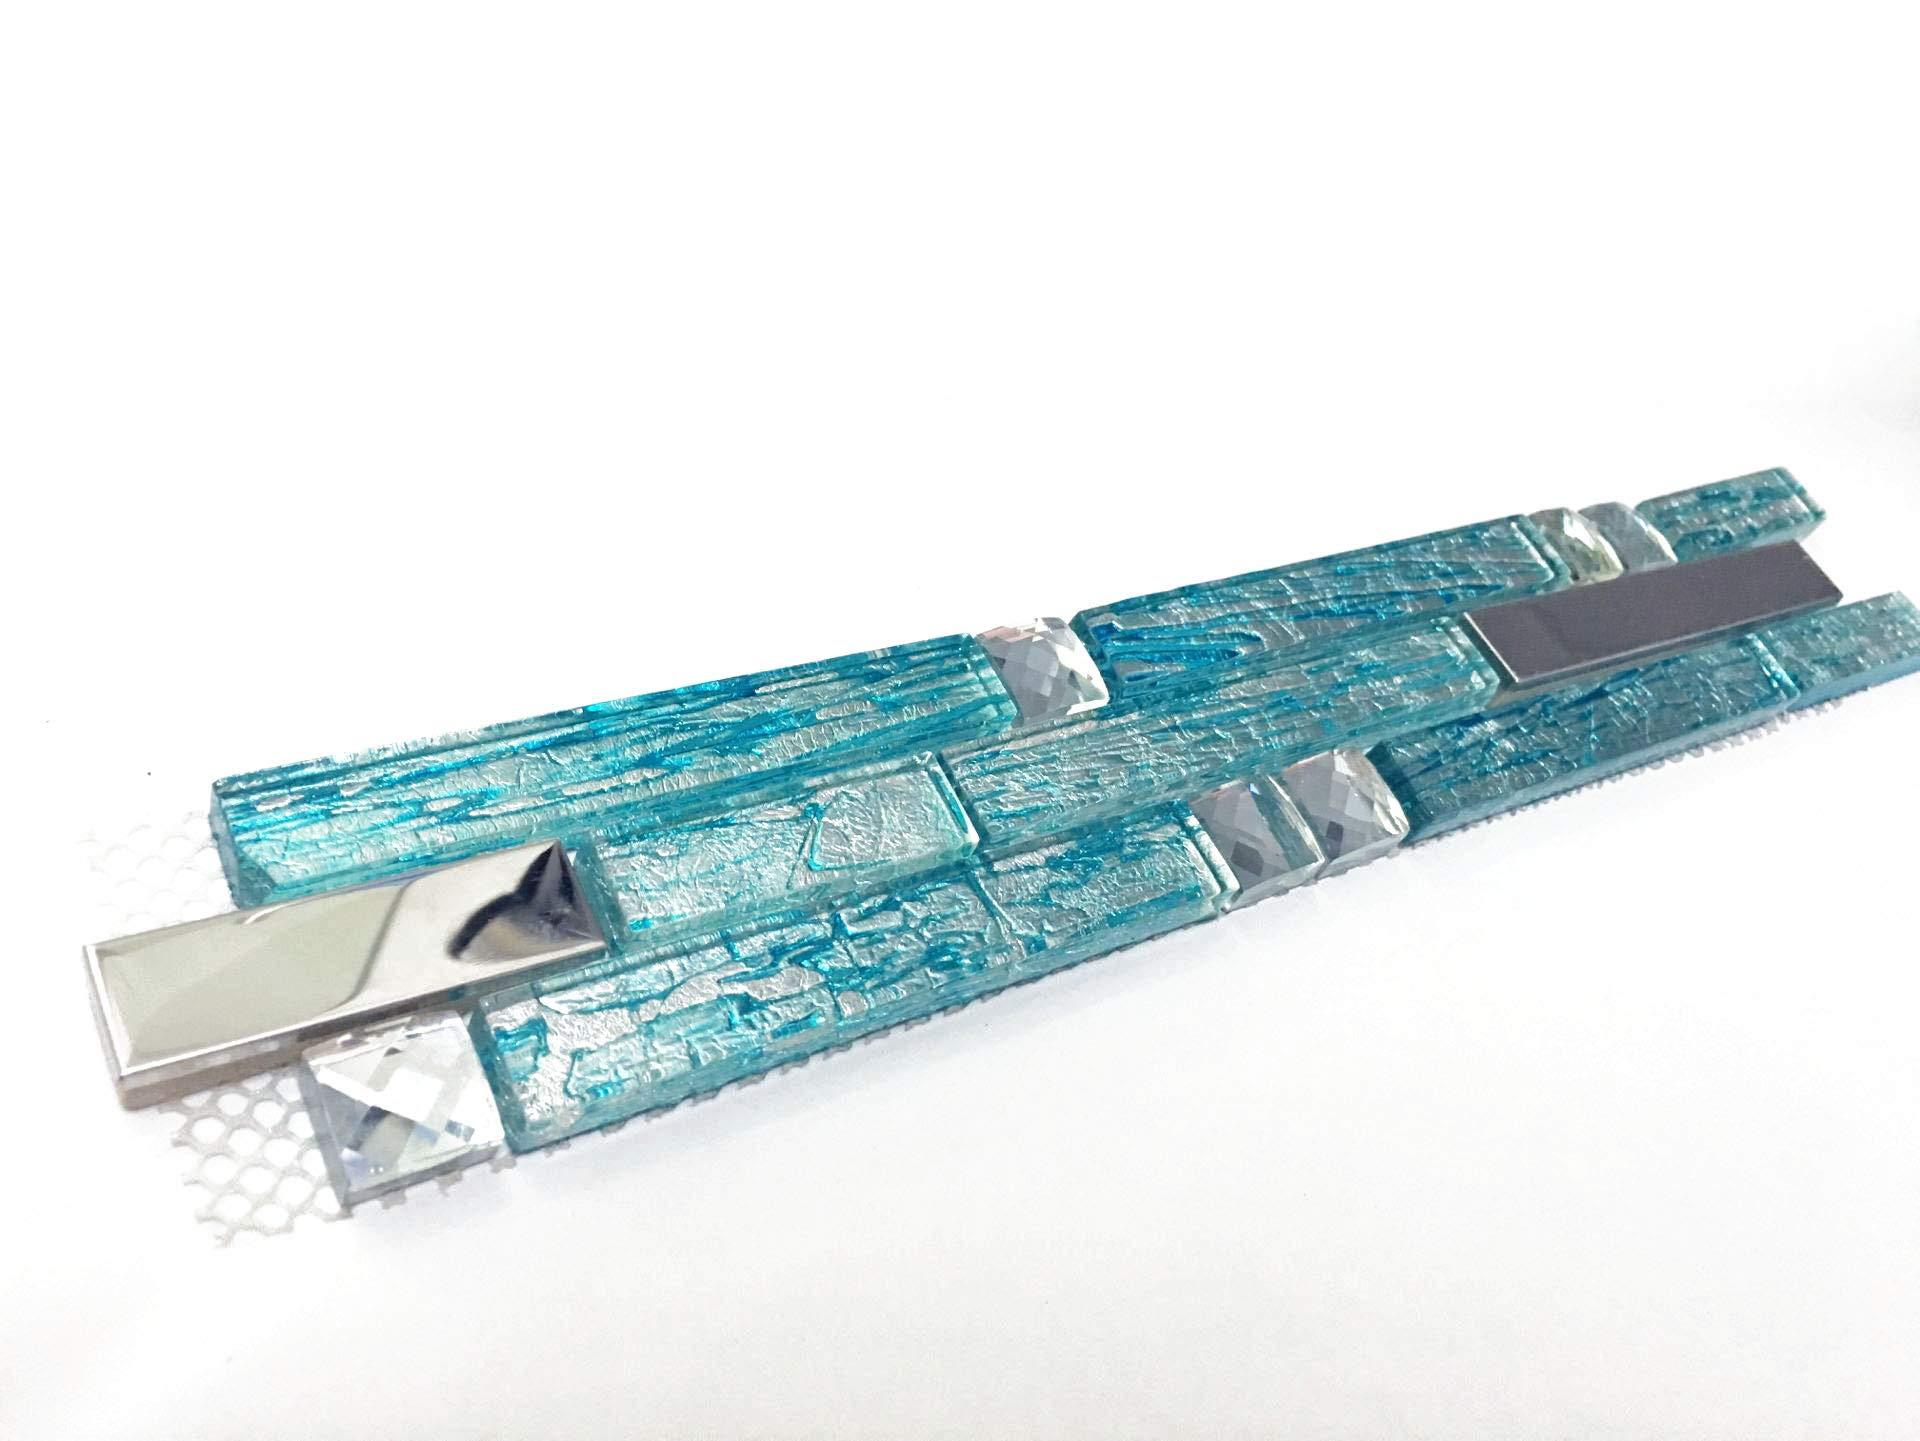 Hominter Tile Sample 3 x 12 Inches: Silver Stainless Steel Tile, Aqua Blue Glass Backsplash Tiles - Kitchen, Bathroom, Shower Wall Decor H20